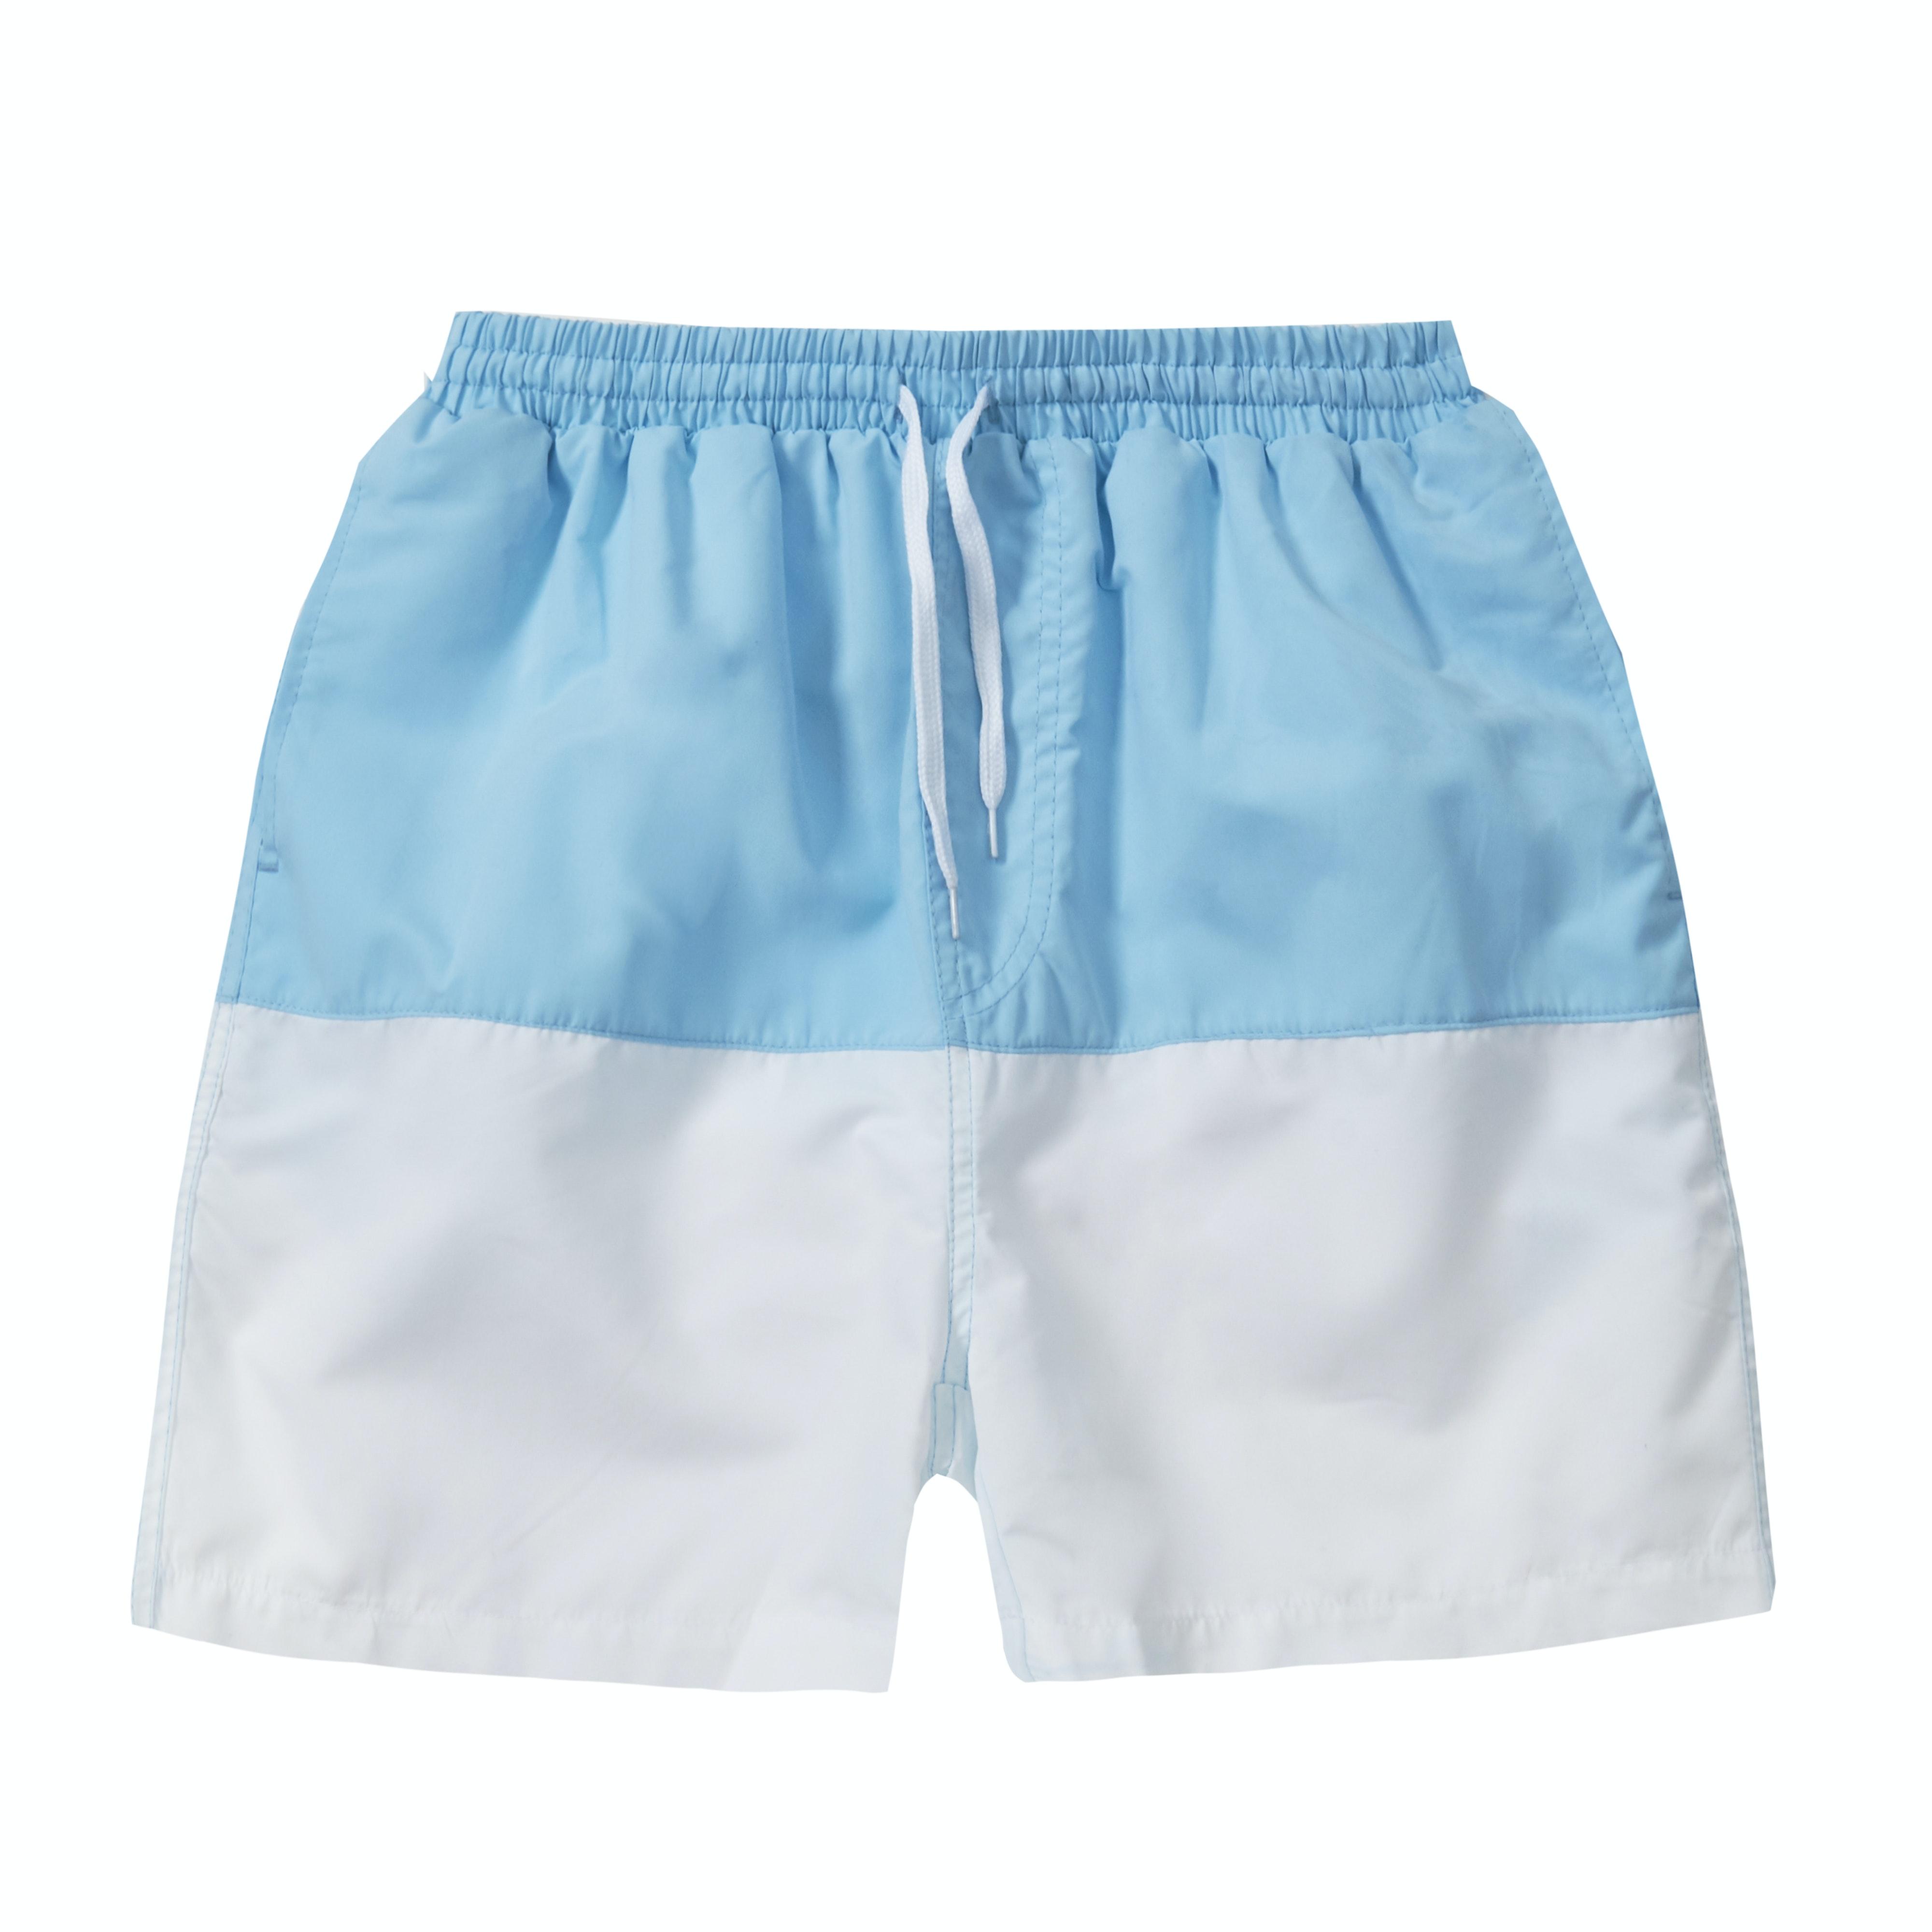 Baum Two Tone Swim Shorts Blue/White